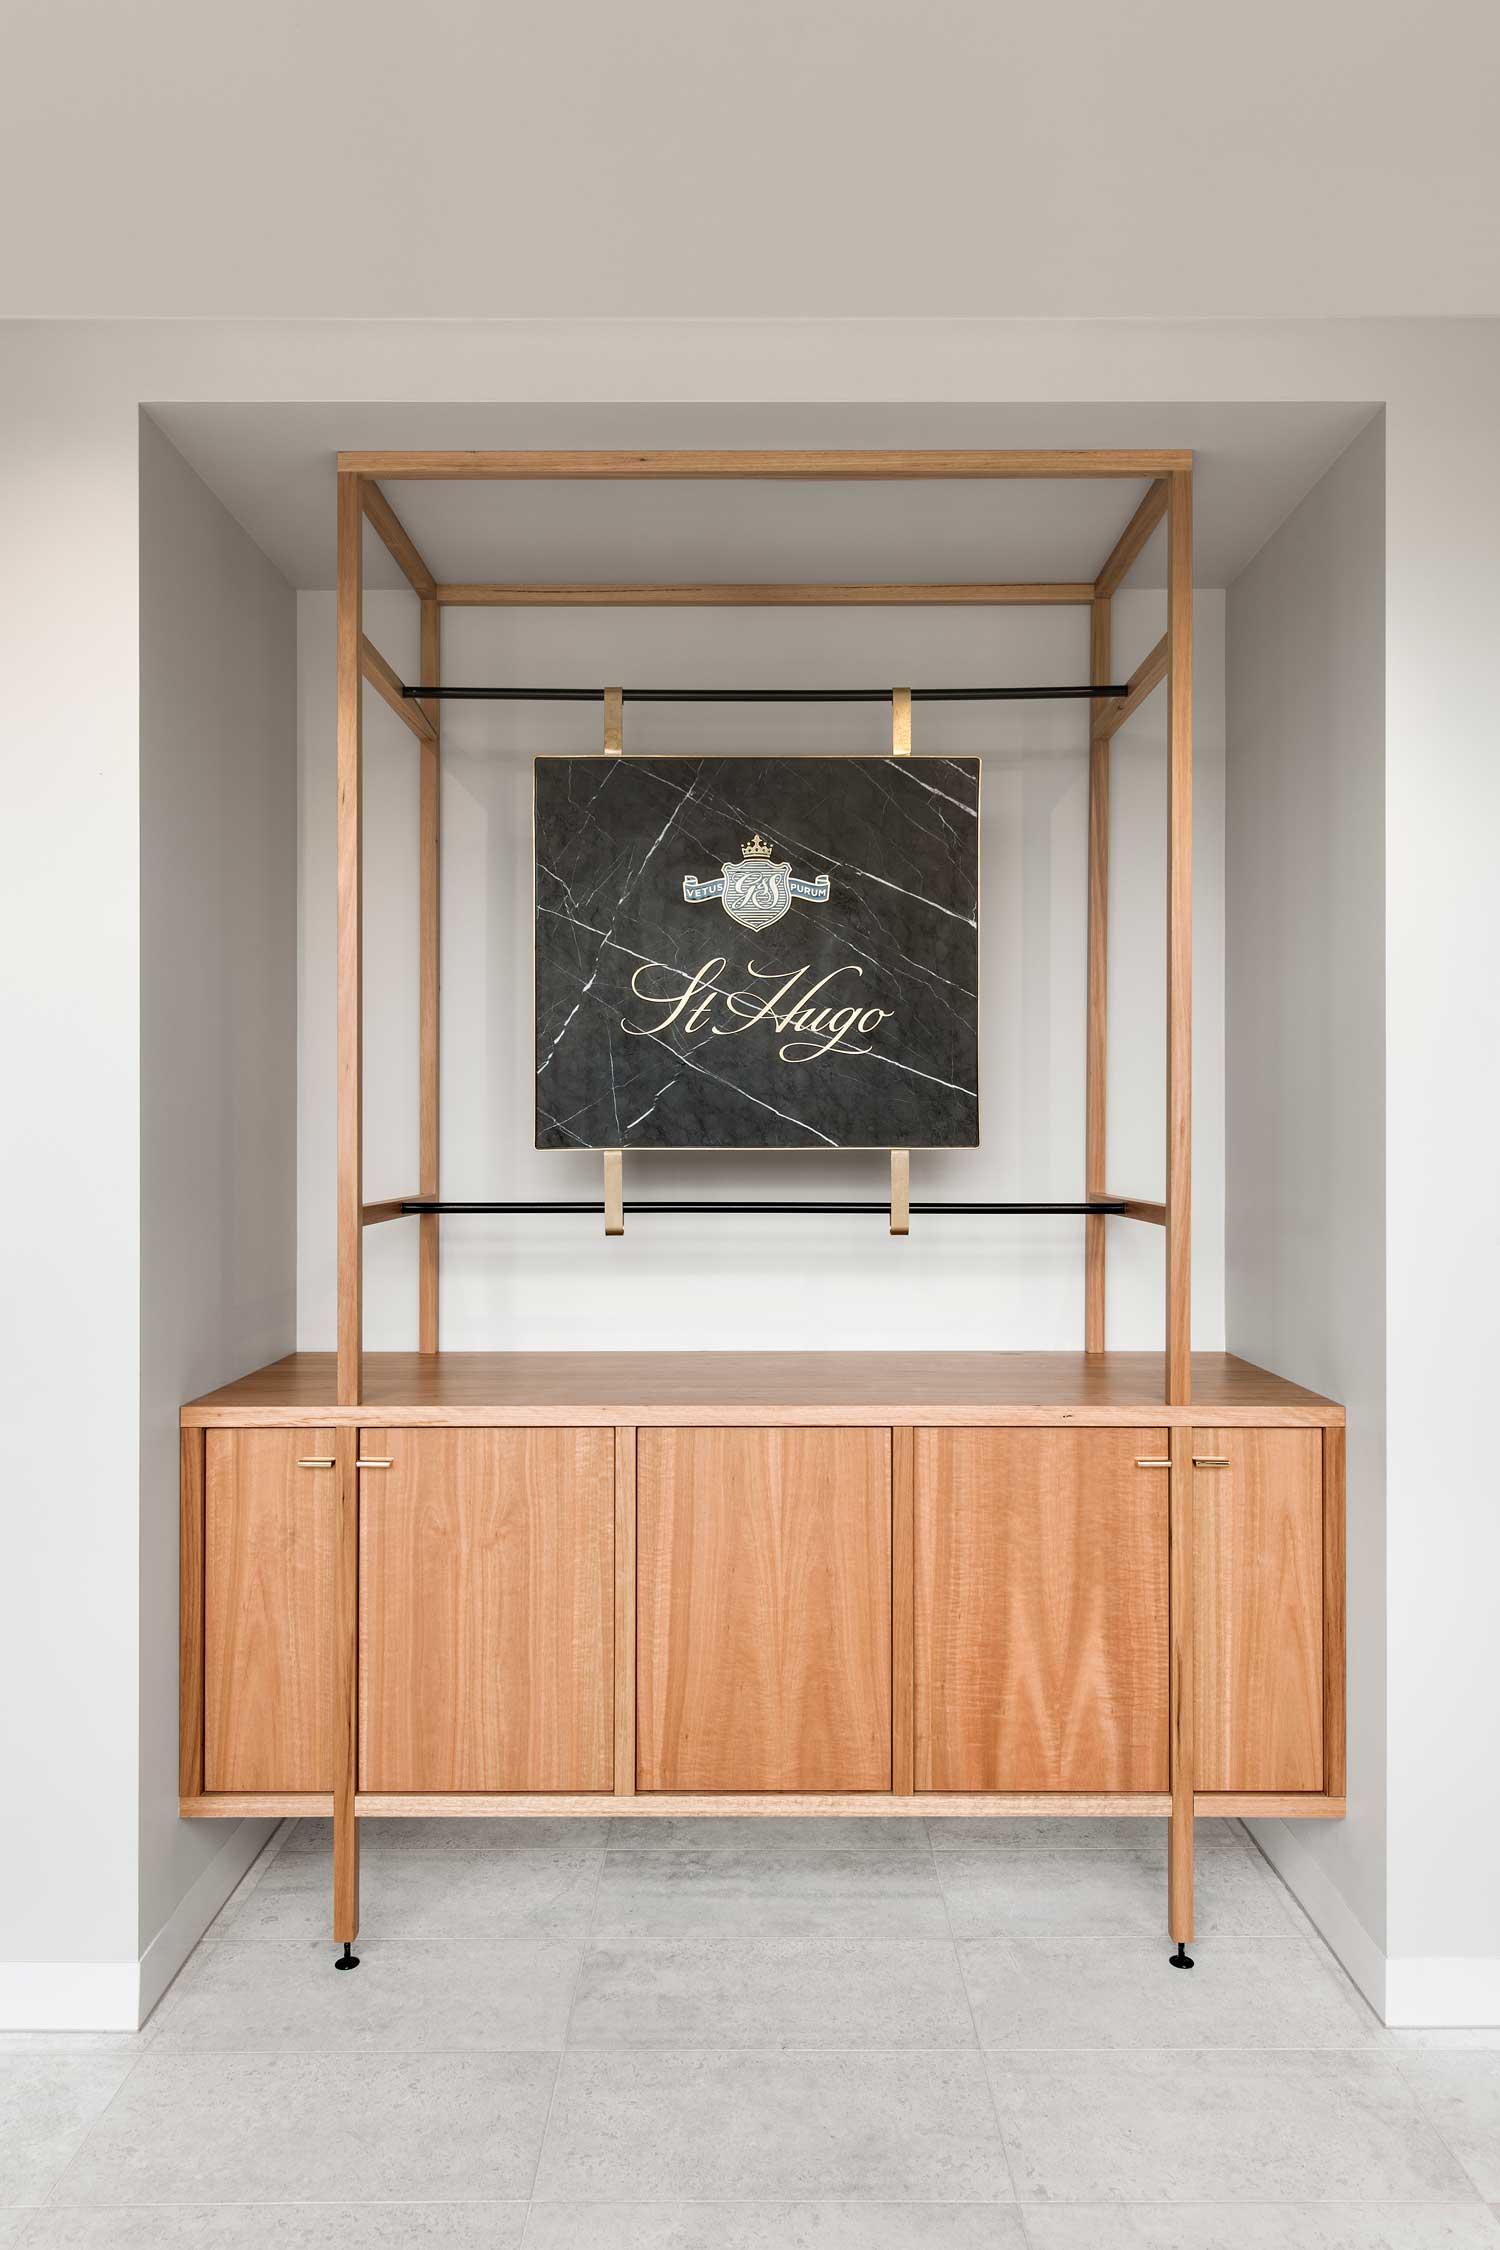 St-Hugo-Wine-Cellar-by-Studio-Gram-with-JBG-Architects-Yellowtrace-12.jpg